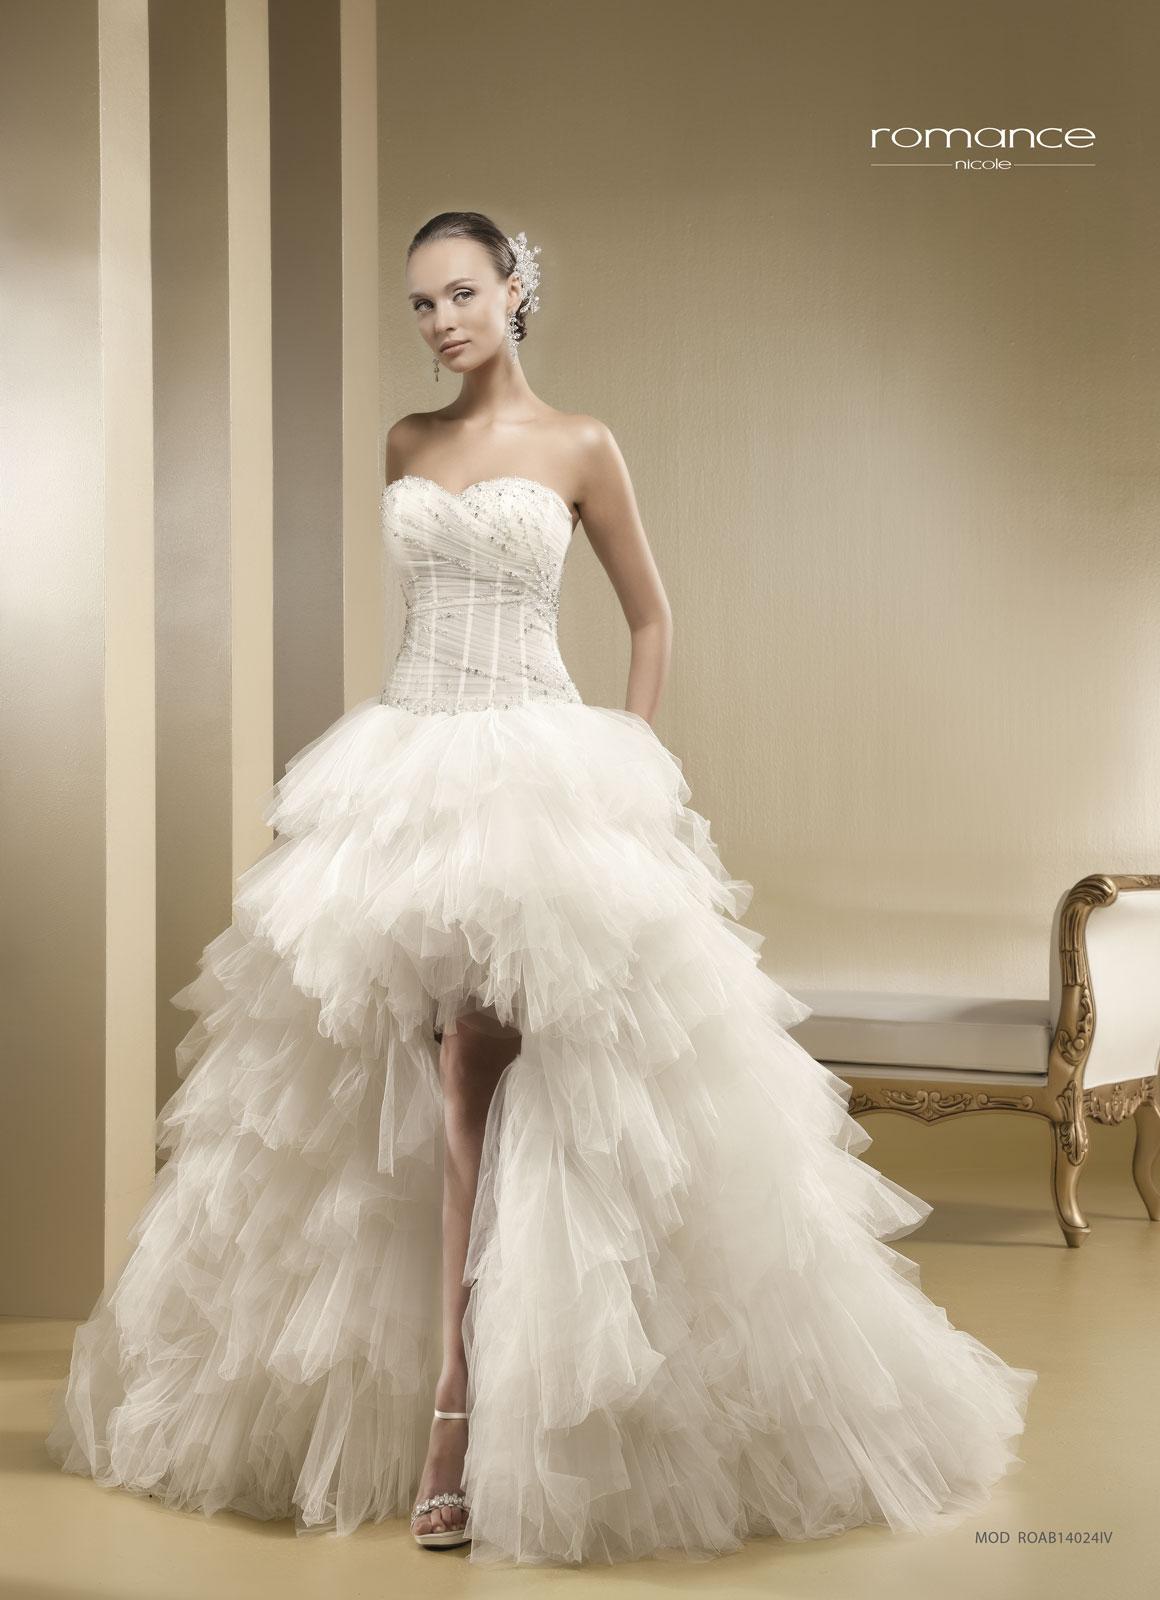 6bba20ef2ad9 Romance Bridal Collection 2014 - Nicole Fashion Group